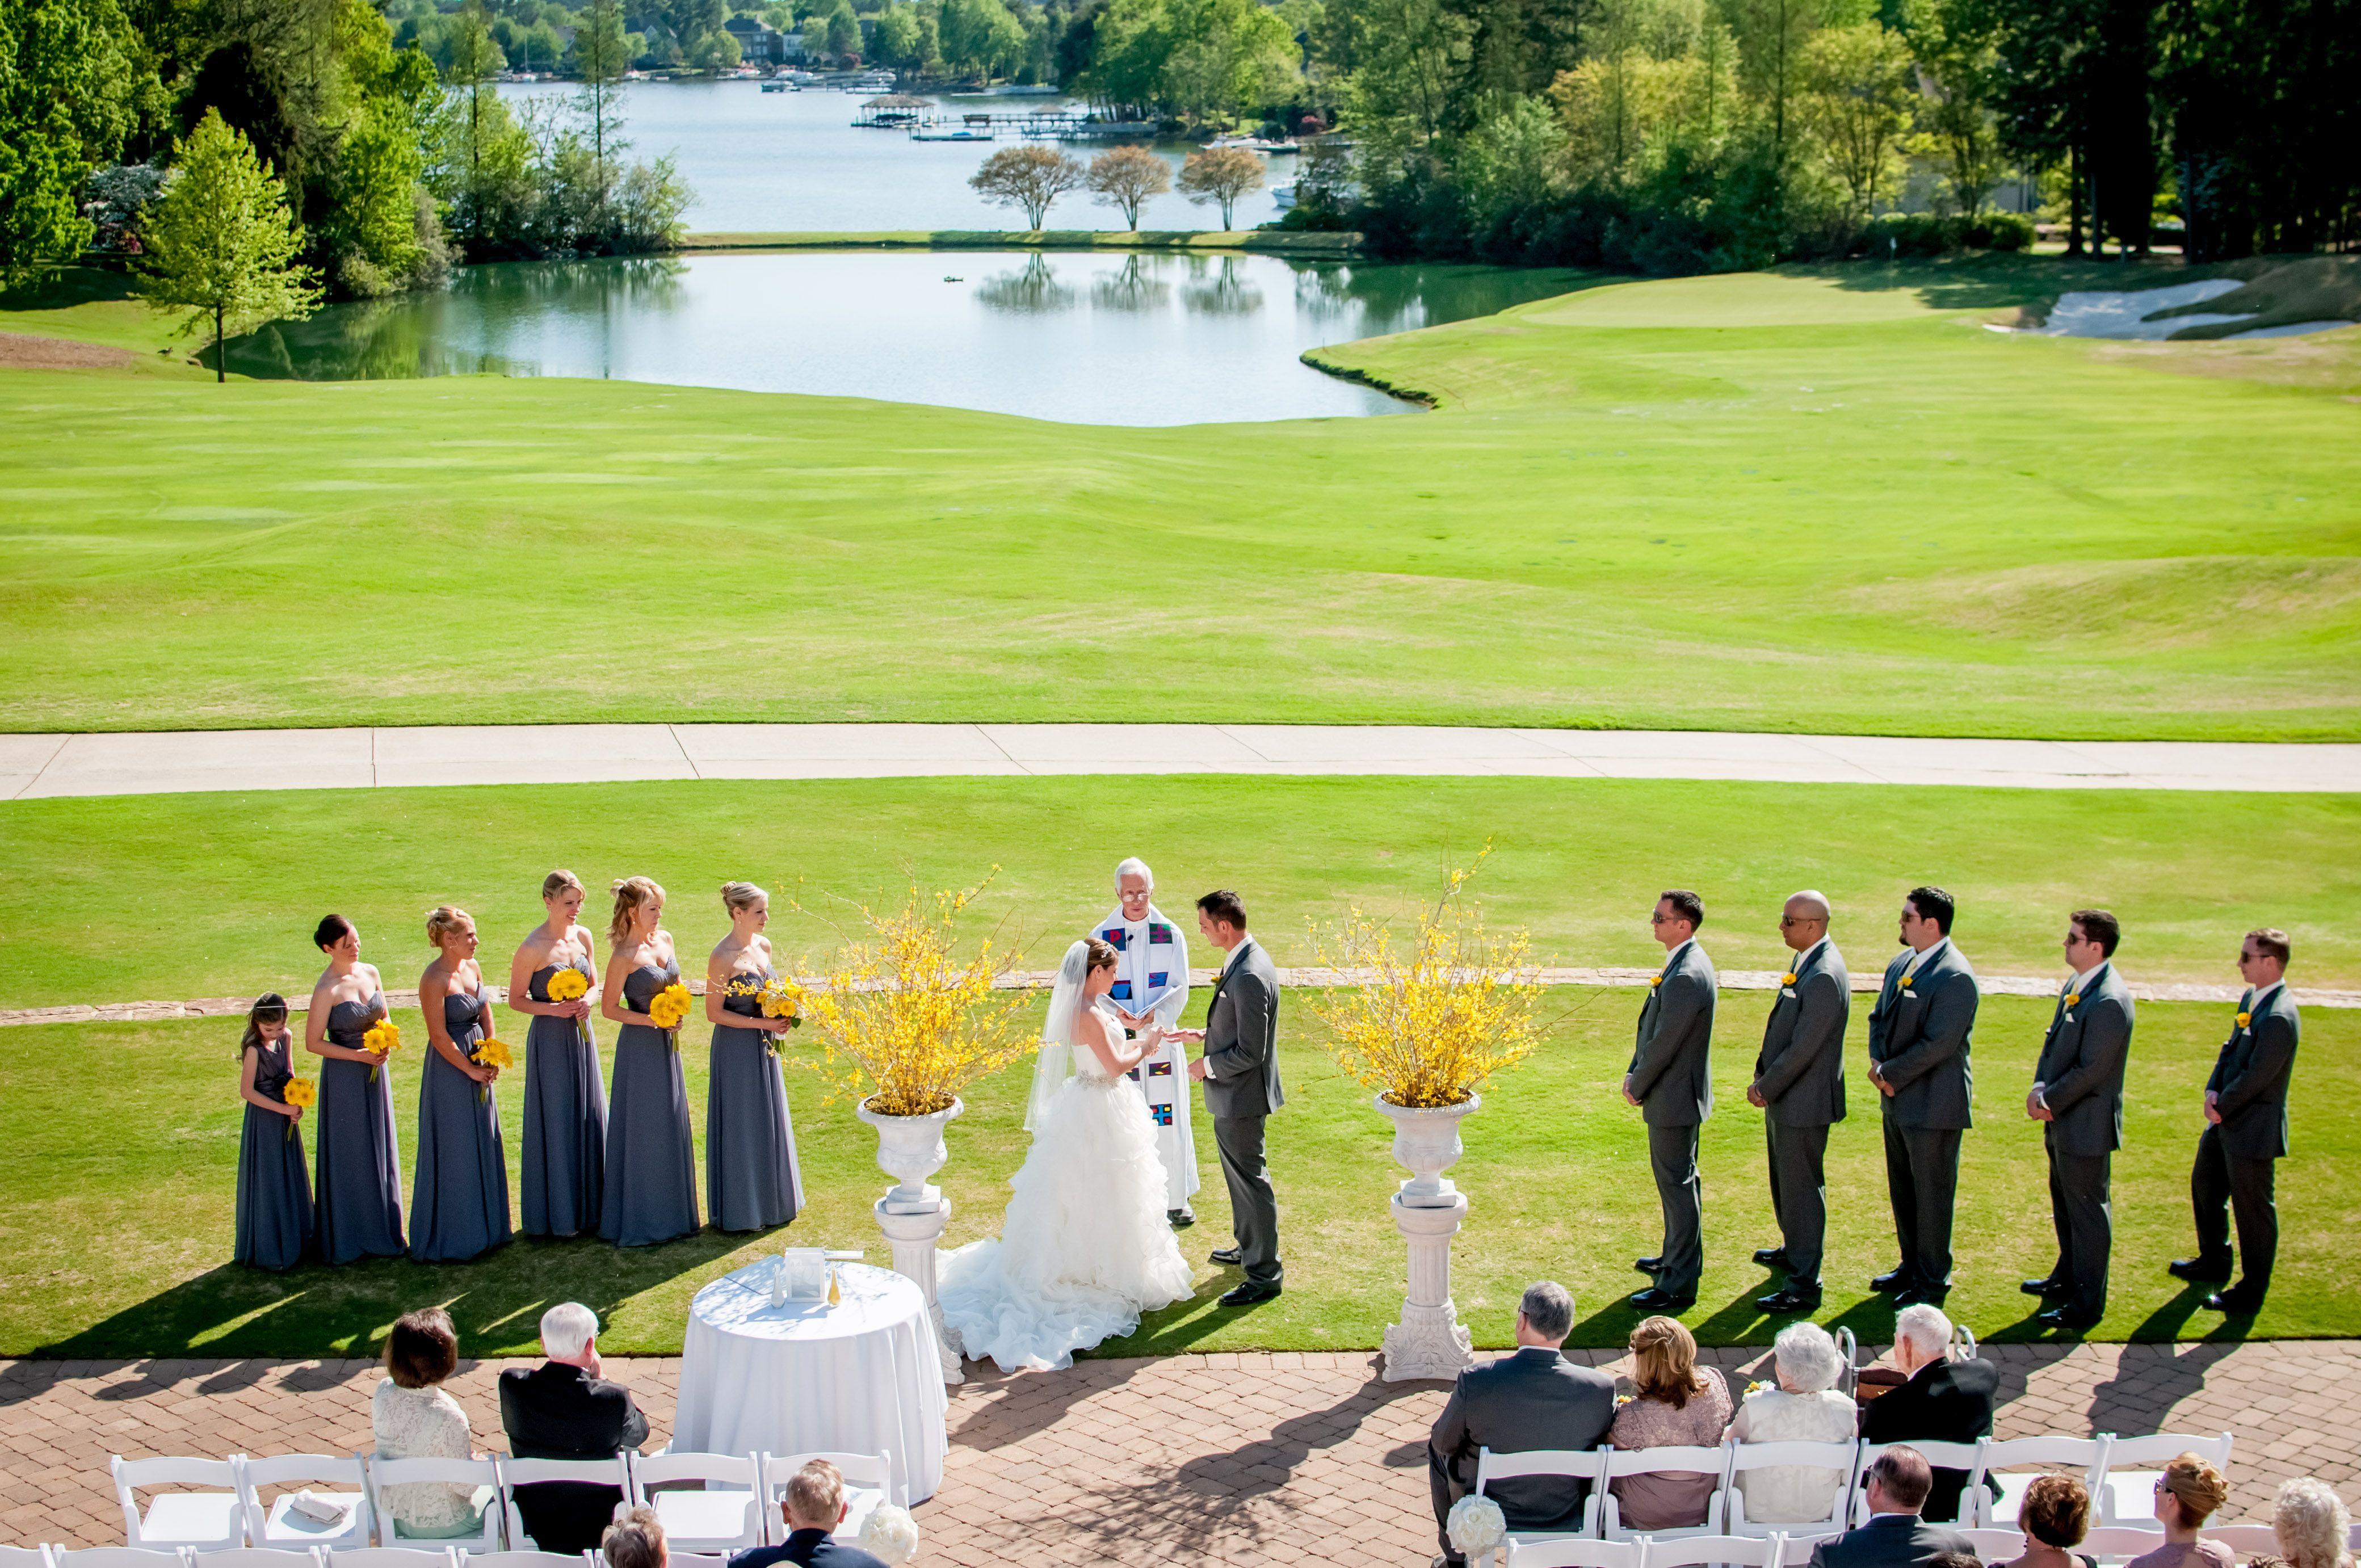 Outdoor summer weddings how to beat the heat wedding planning